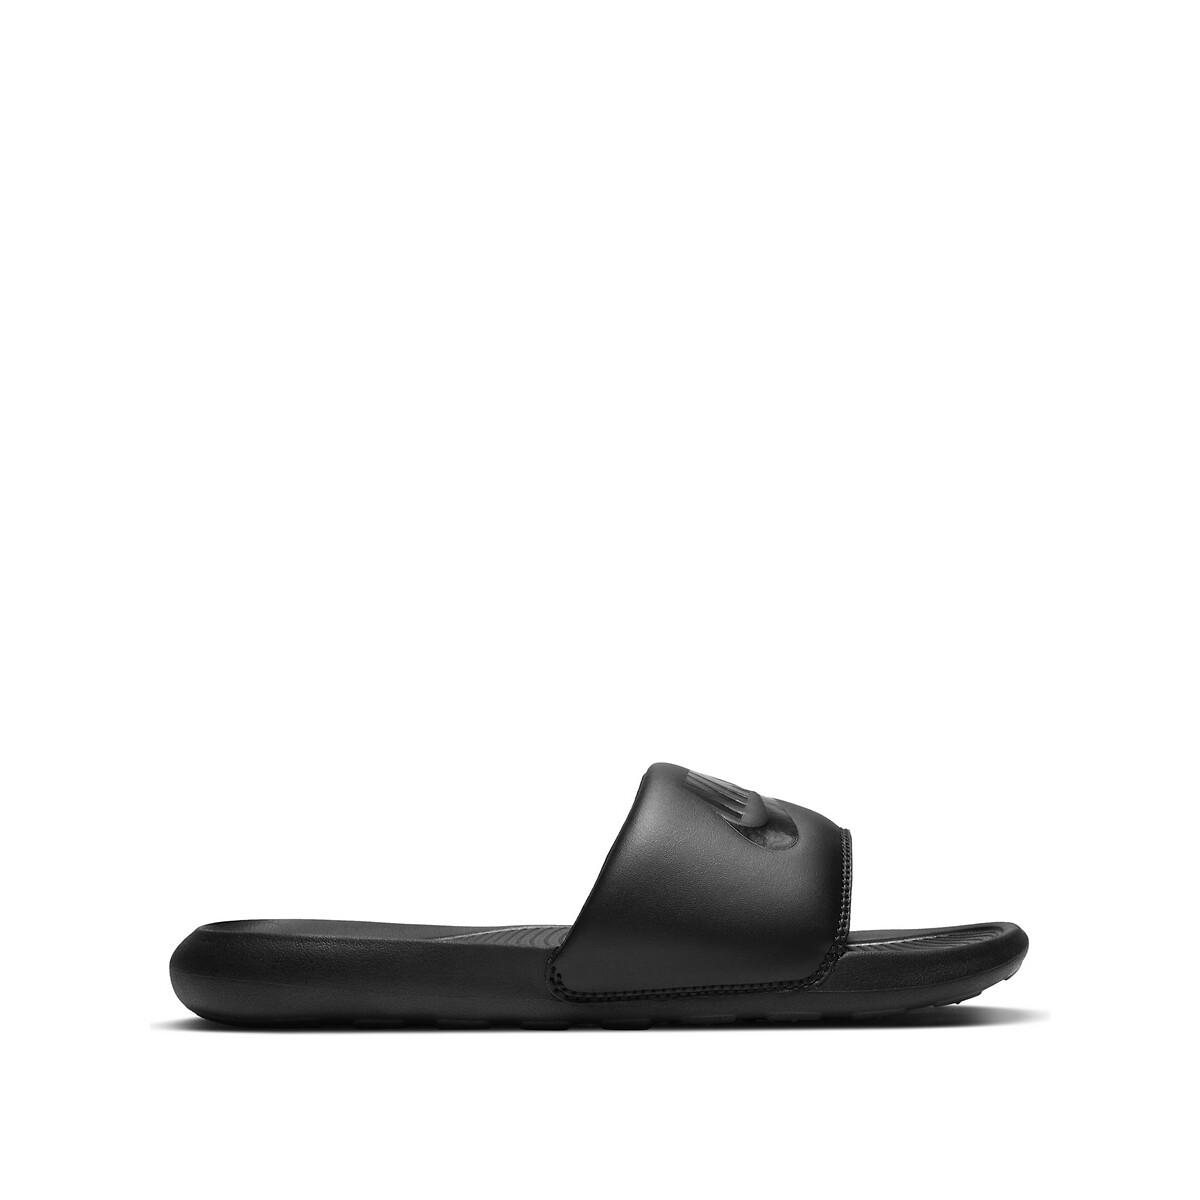 Nike Victori One Slipper voor dames Black/Black/Black Dames online kopen